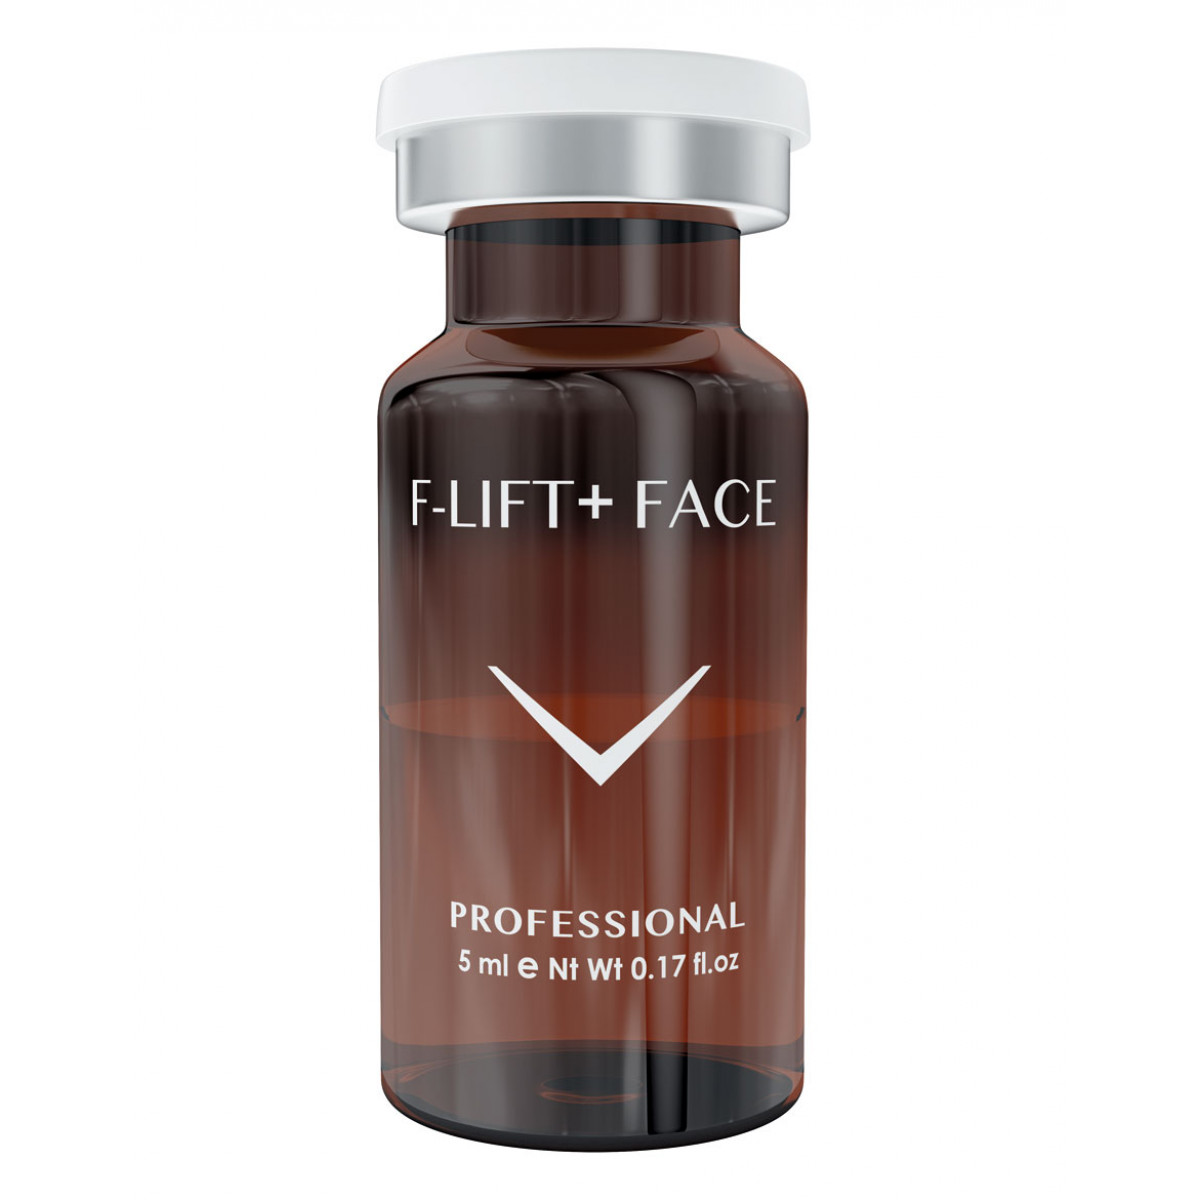 F-LIFT+ FACE